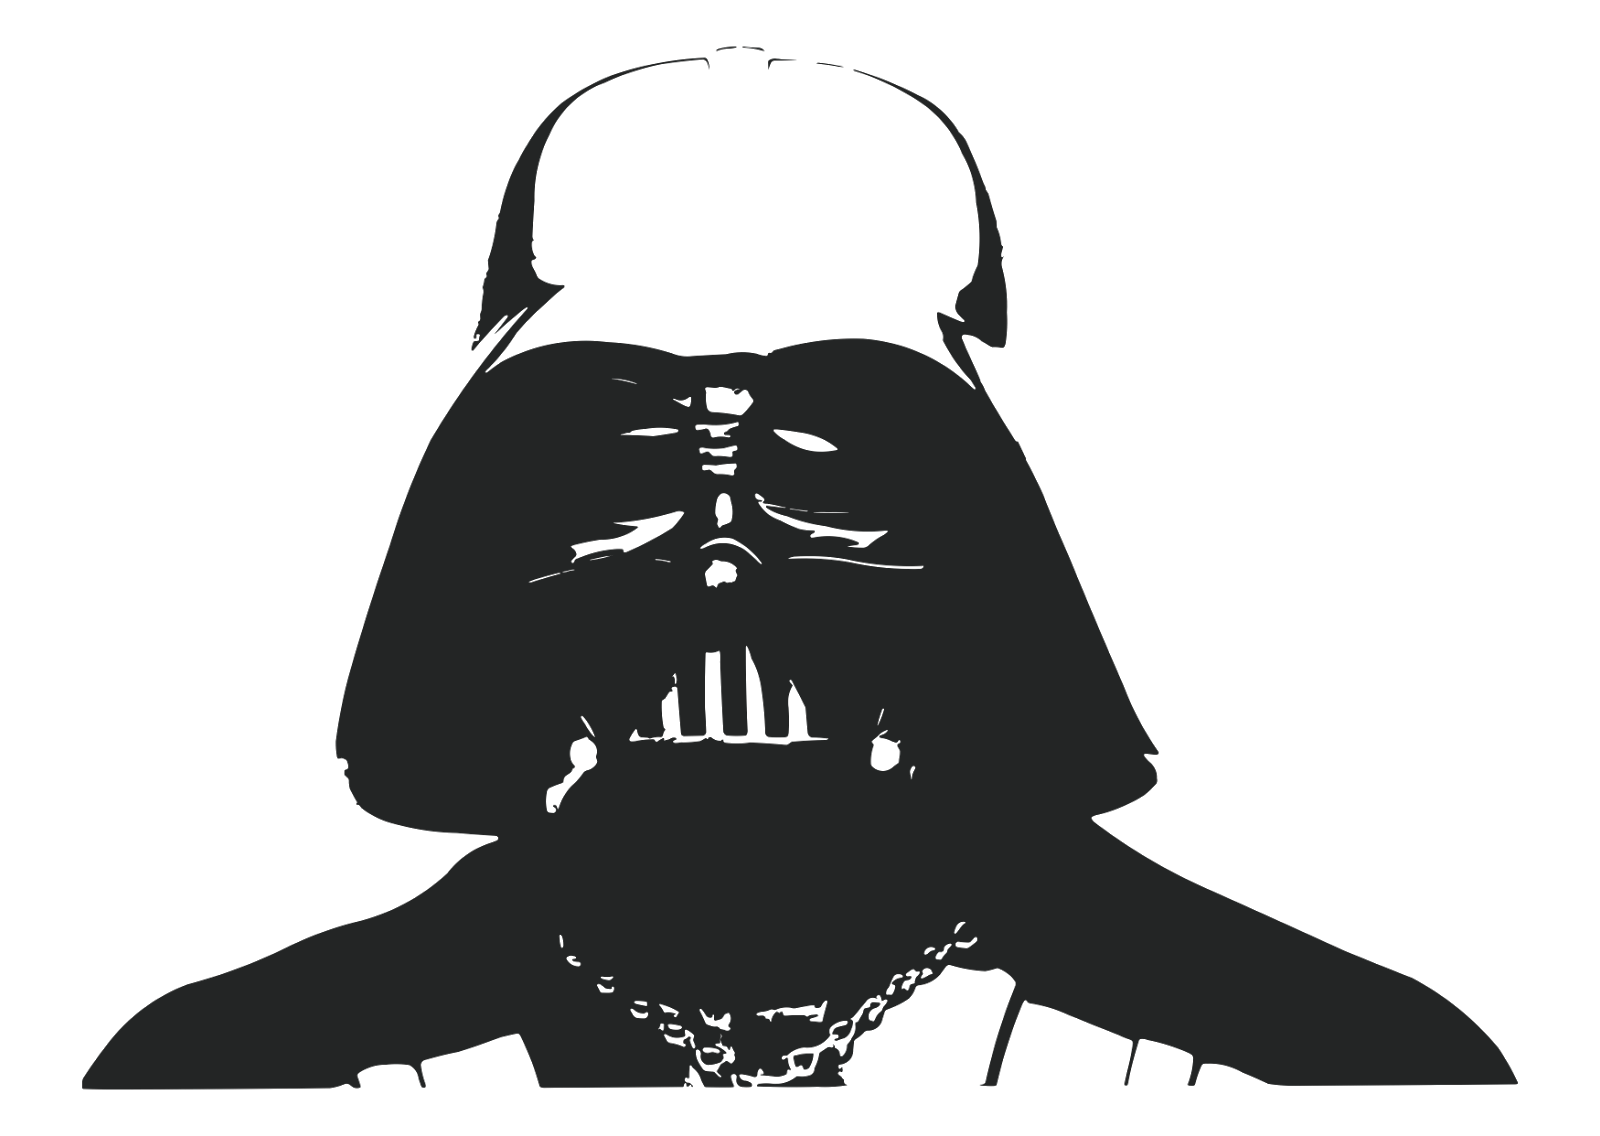 Darth vader Logo Vector ~ Format Cdr, Ai, Eps, Svg, PDF, PNG